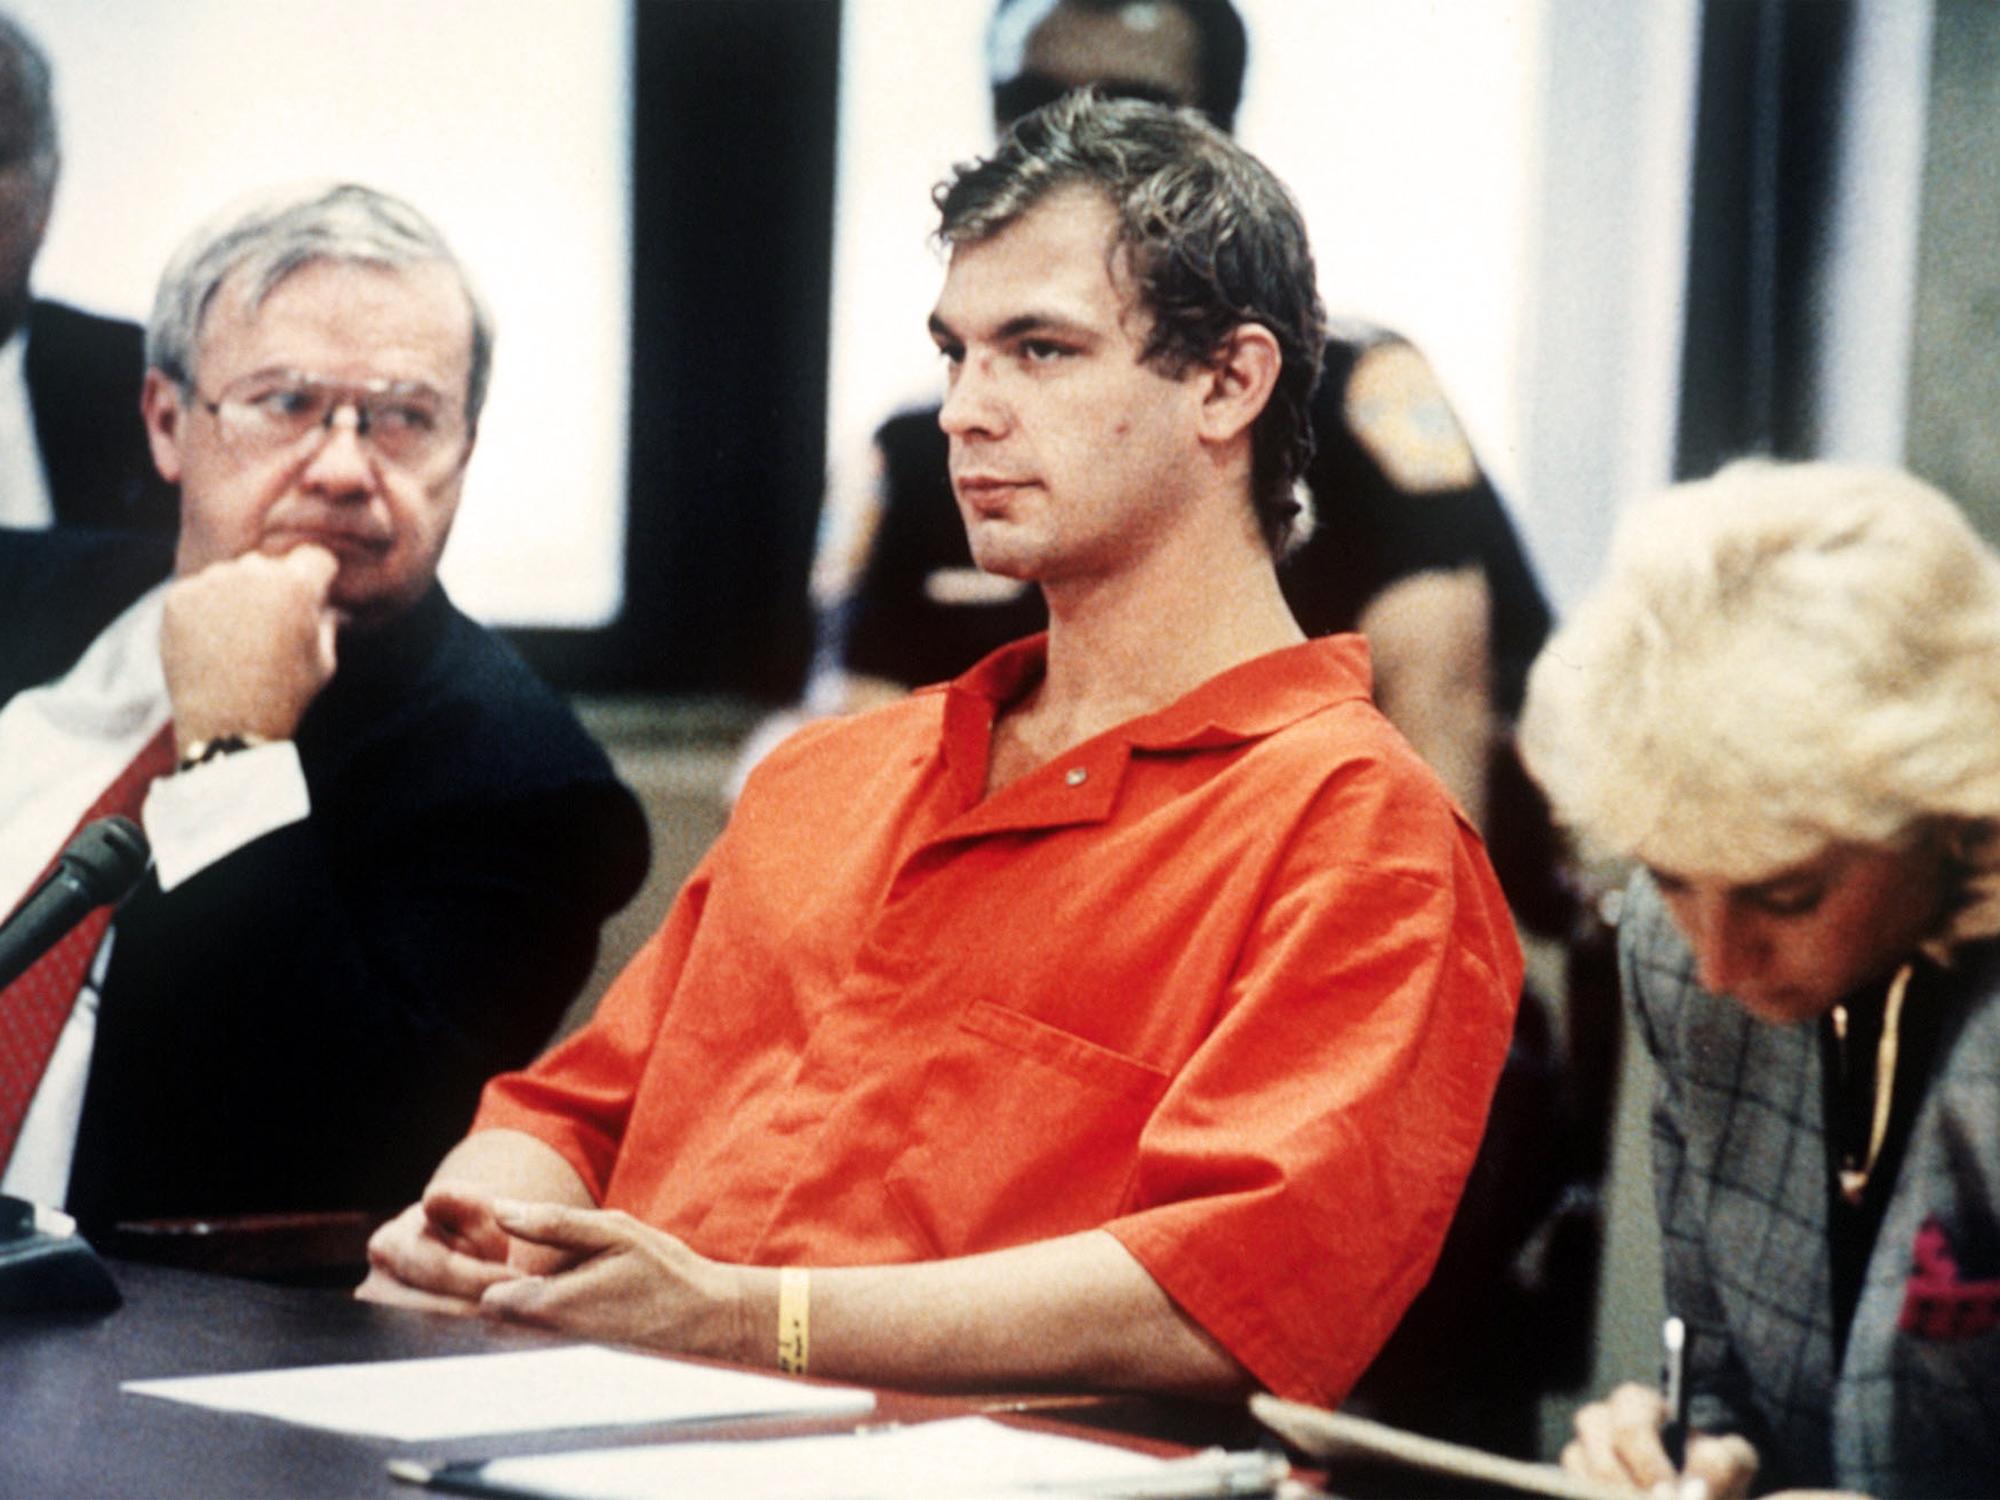 Disney star becomes Jeffrey Dahmer in Ohio-made movie